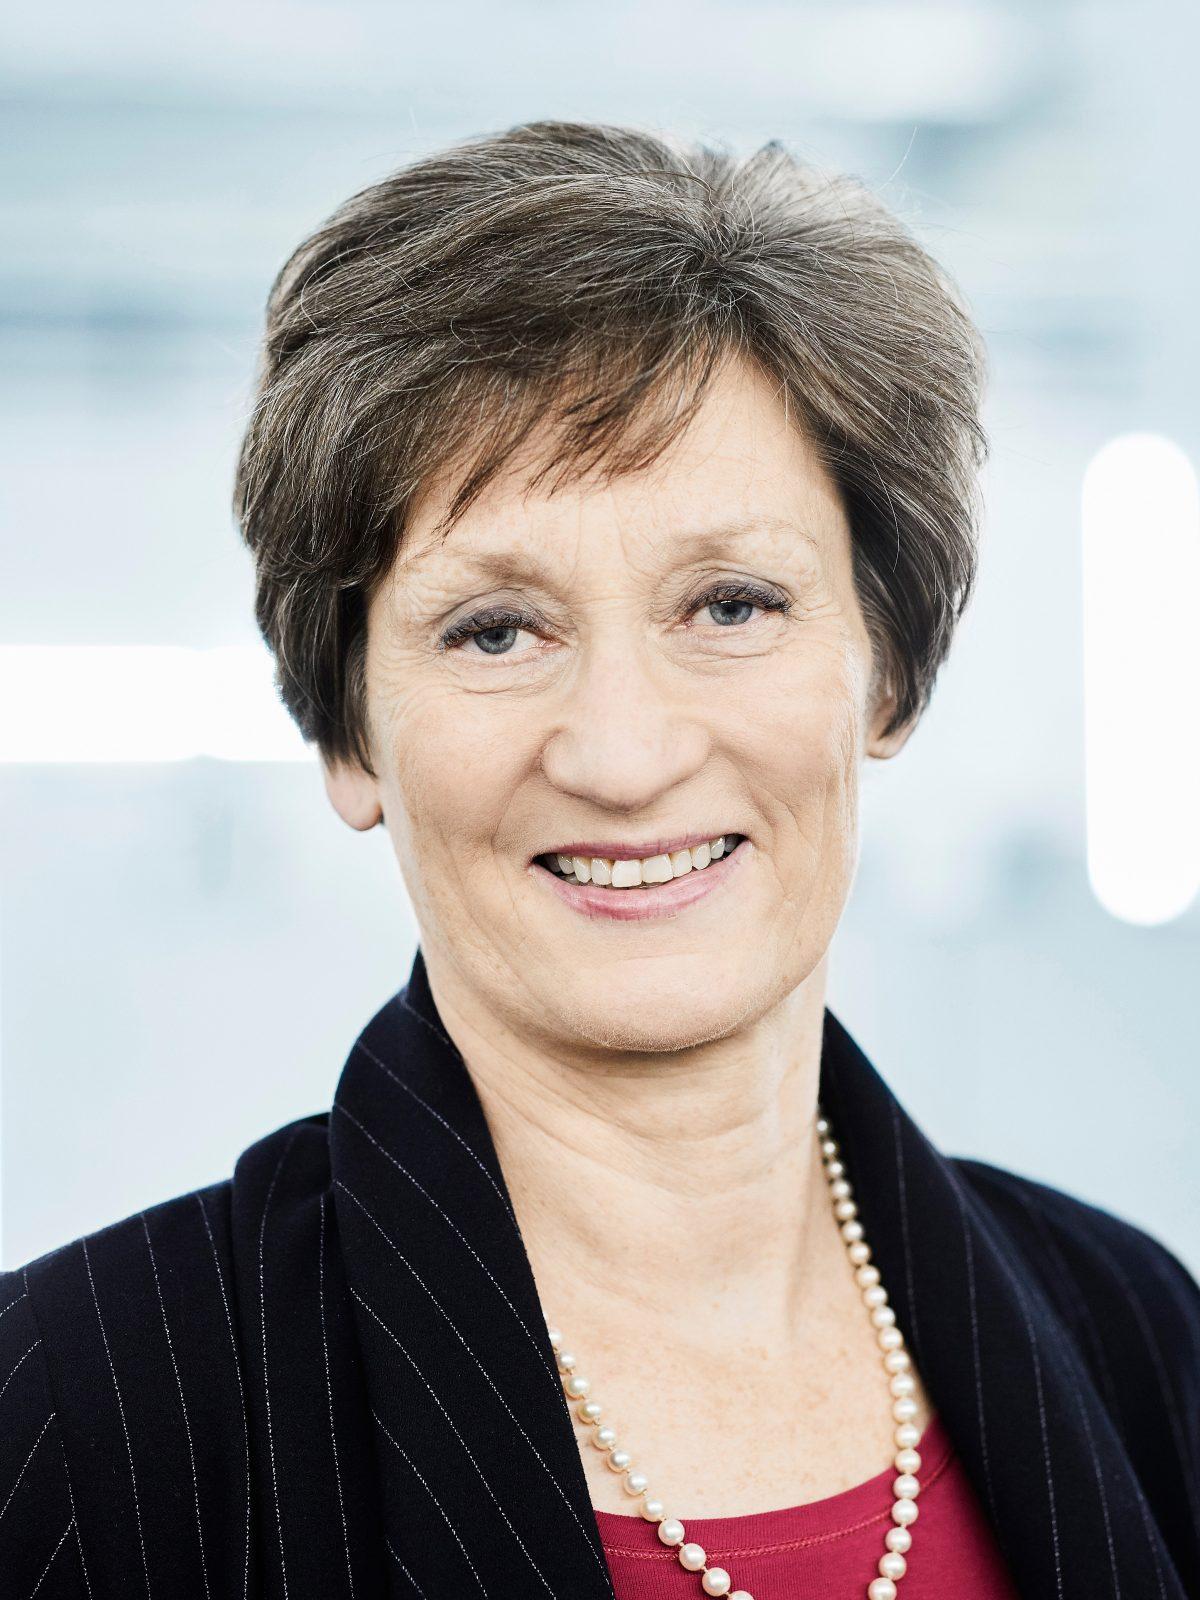 Prof. Dr. Dr. h.c. mult. Sarah M. Springman, Rector of ETH Zurich   ETH Centre for Students & Entrepreneurs